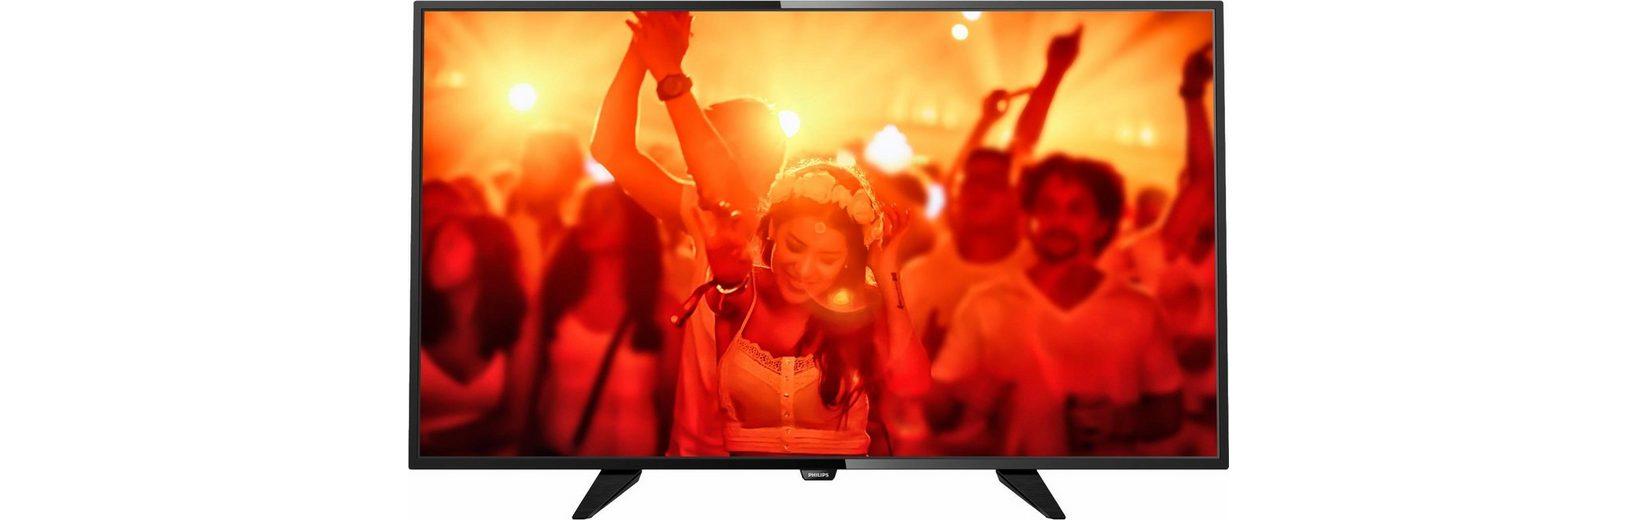 Philips 32PHK4101/12, LED Fernseher, 80 cm (32 Zoll), HD-ready 720p